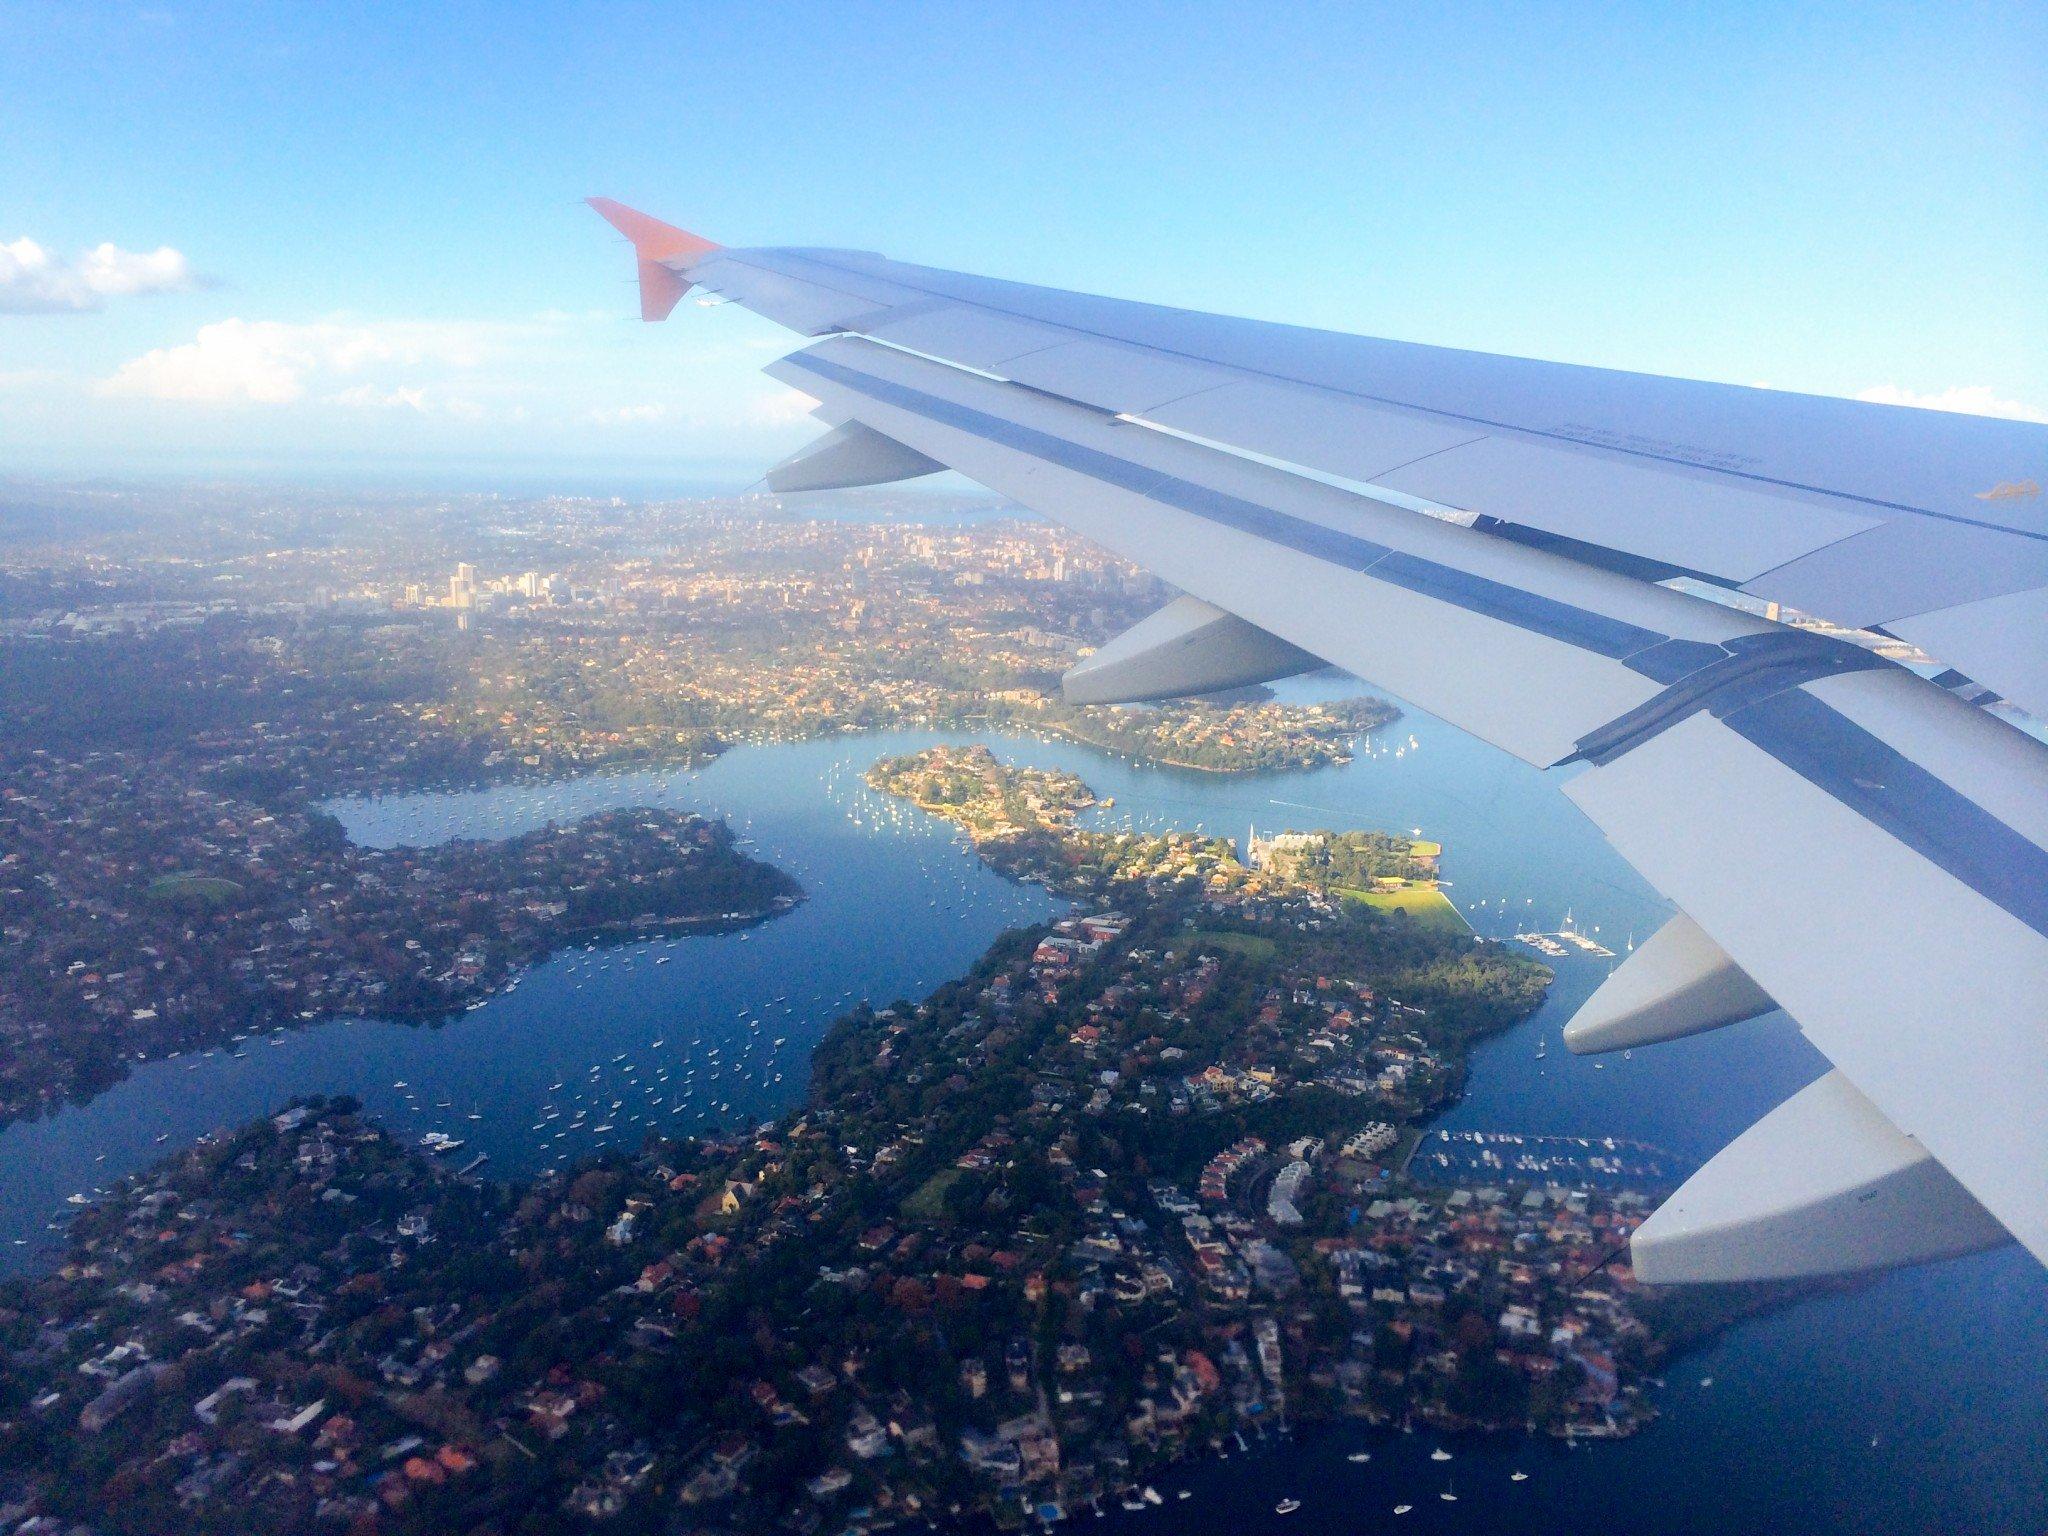 Sydney plane